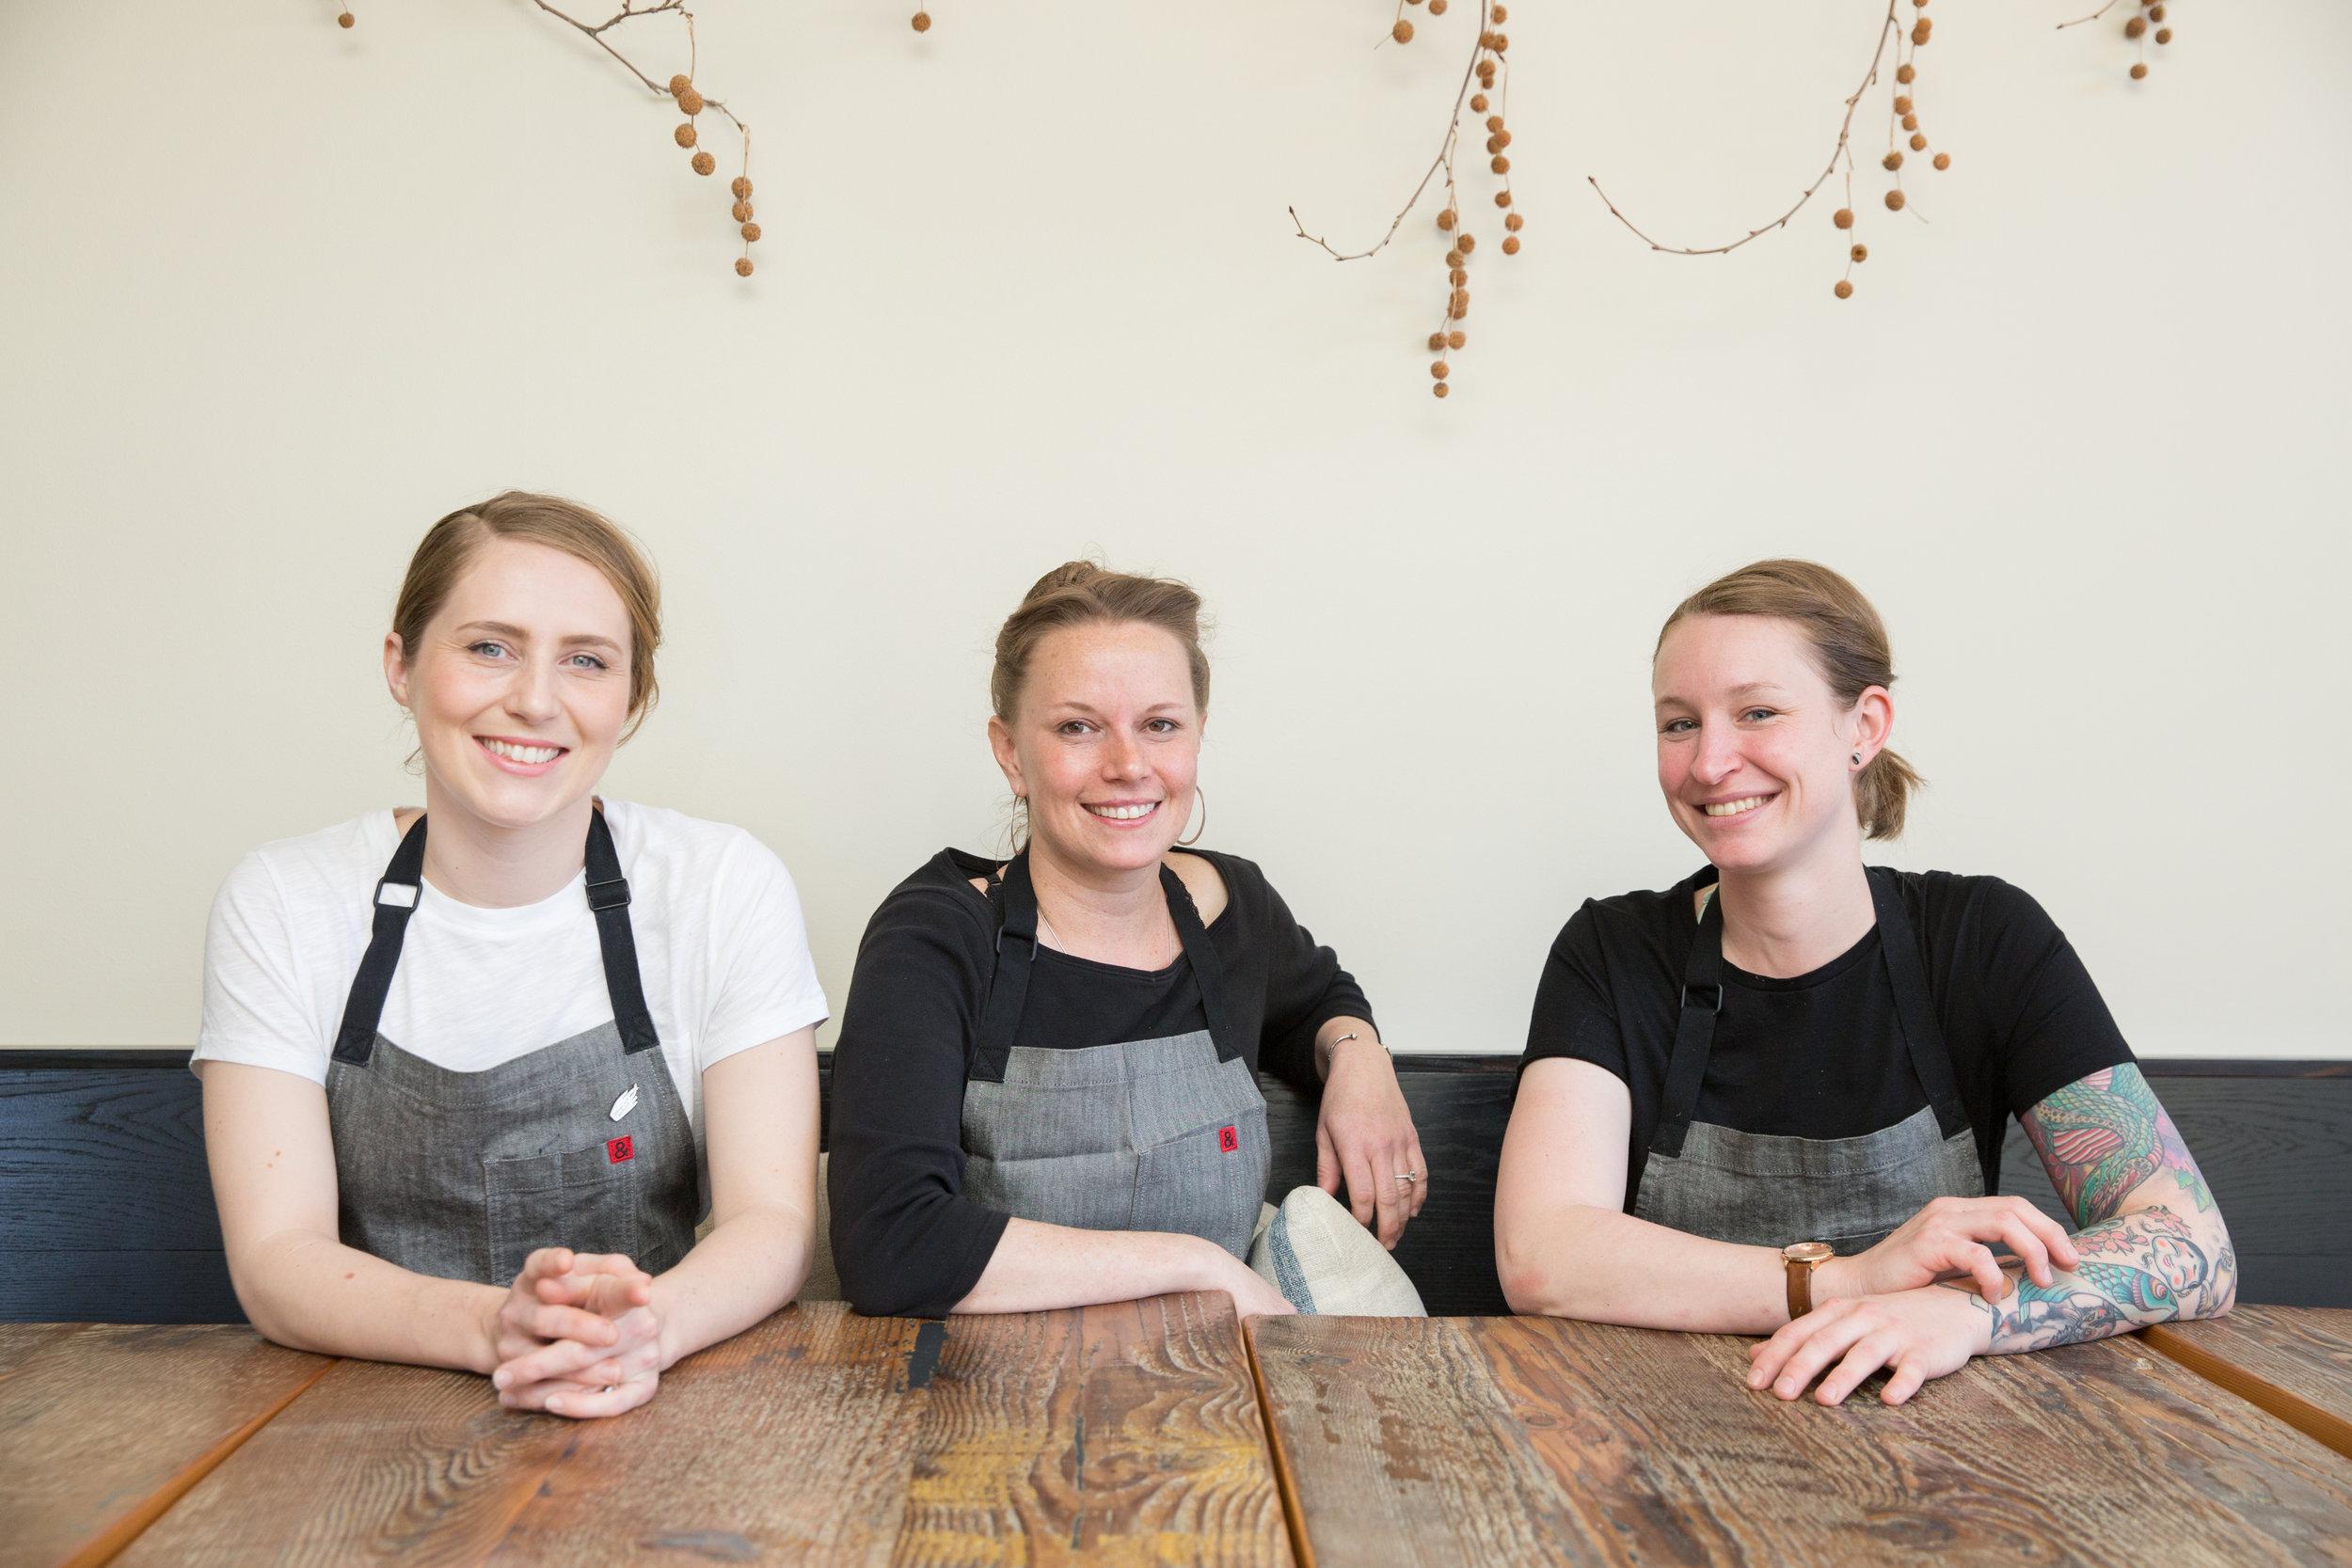 The Octavia chef trio, Sarah Bonar, Melissa Perello, and Sara Hauman photography by Grace Sagar